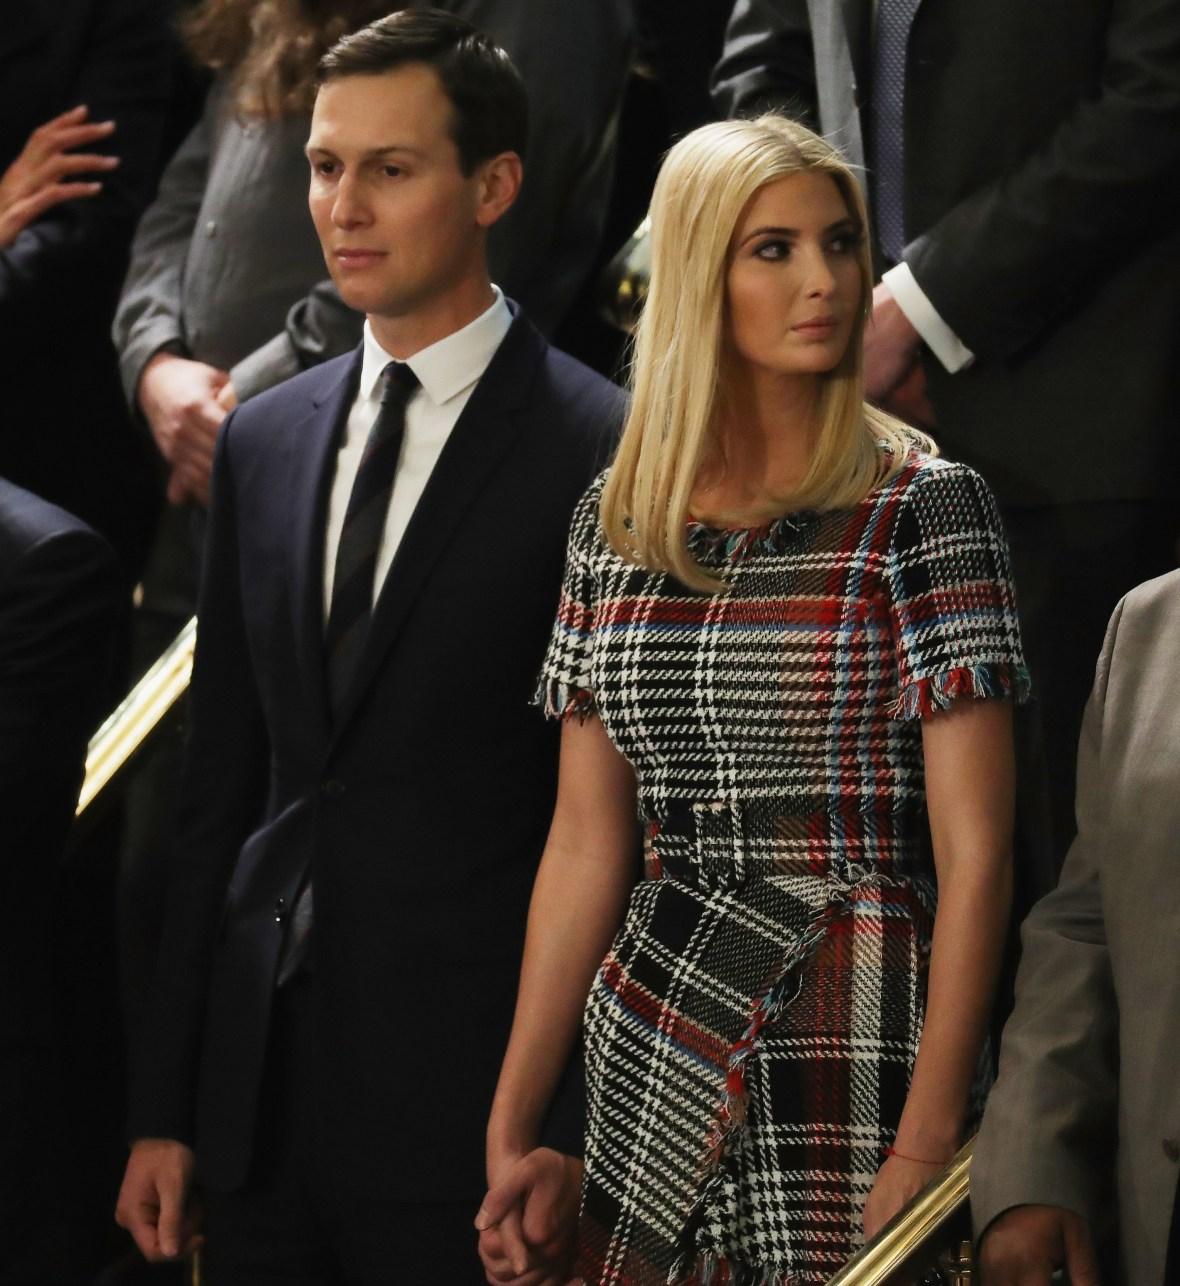 ivanka trump dress getty images